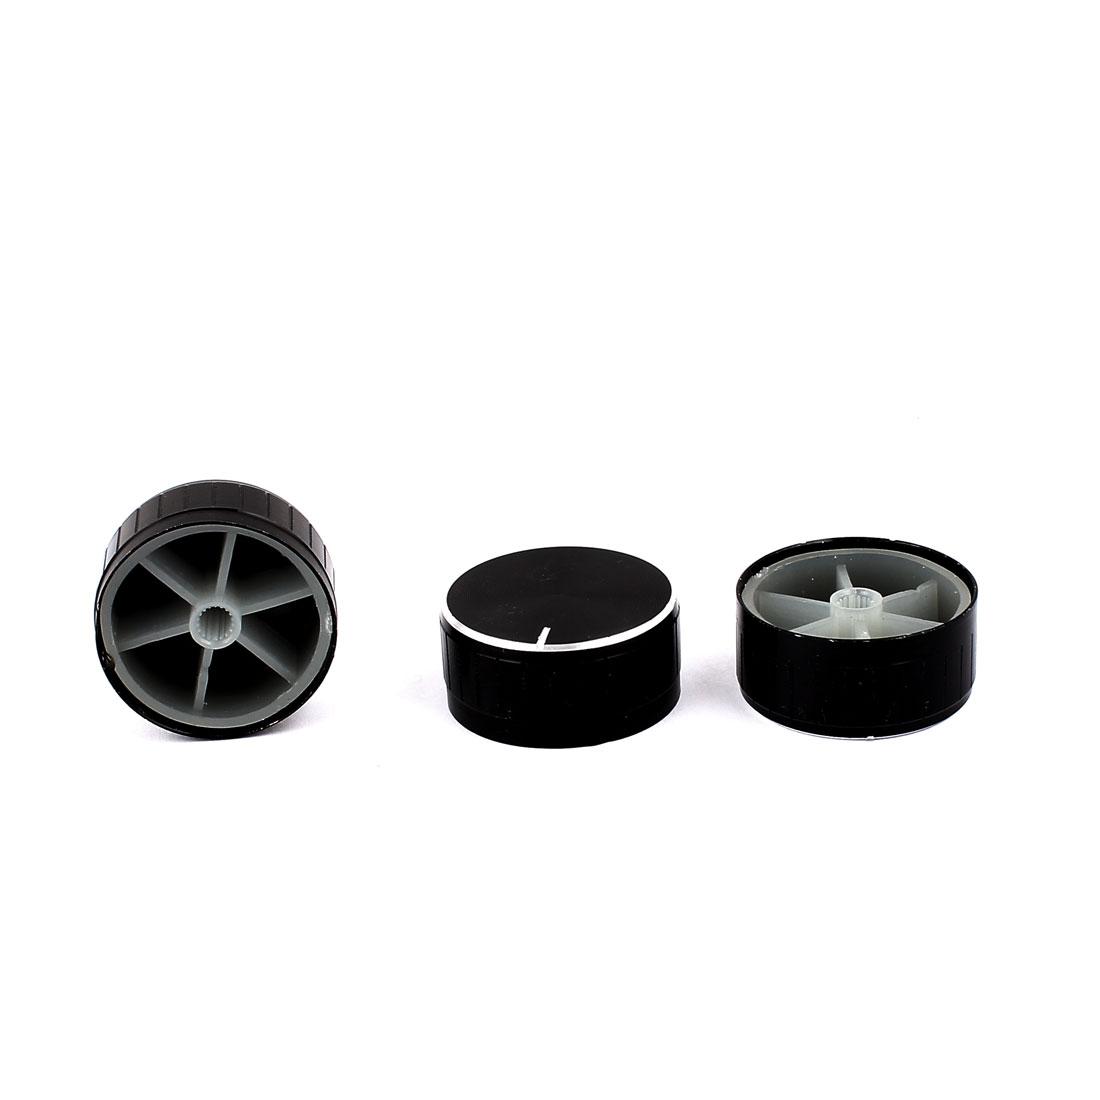 3 Pcs 40mm x 6mm Aluminium Alloy Potentiometer Control Knob Mini Cap Knurled Button Black